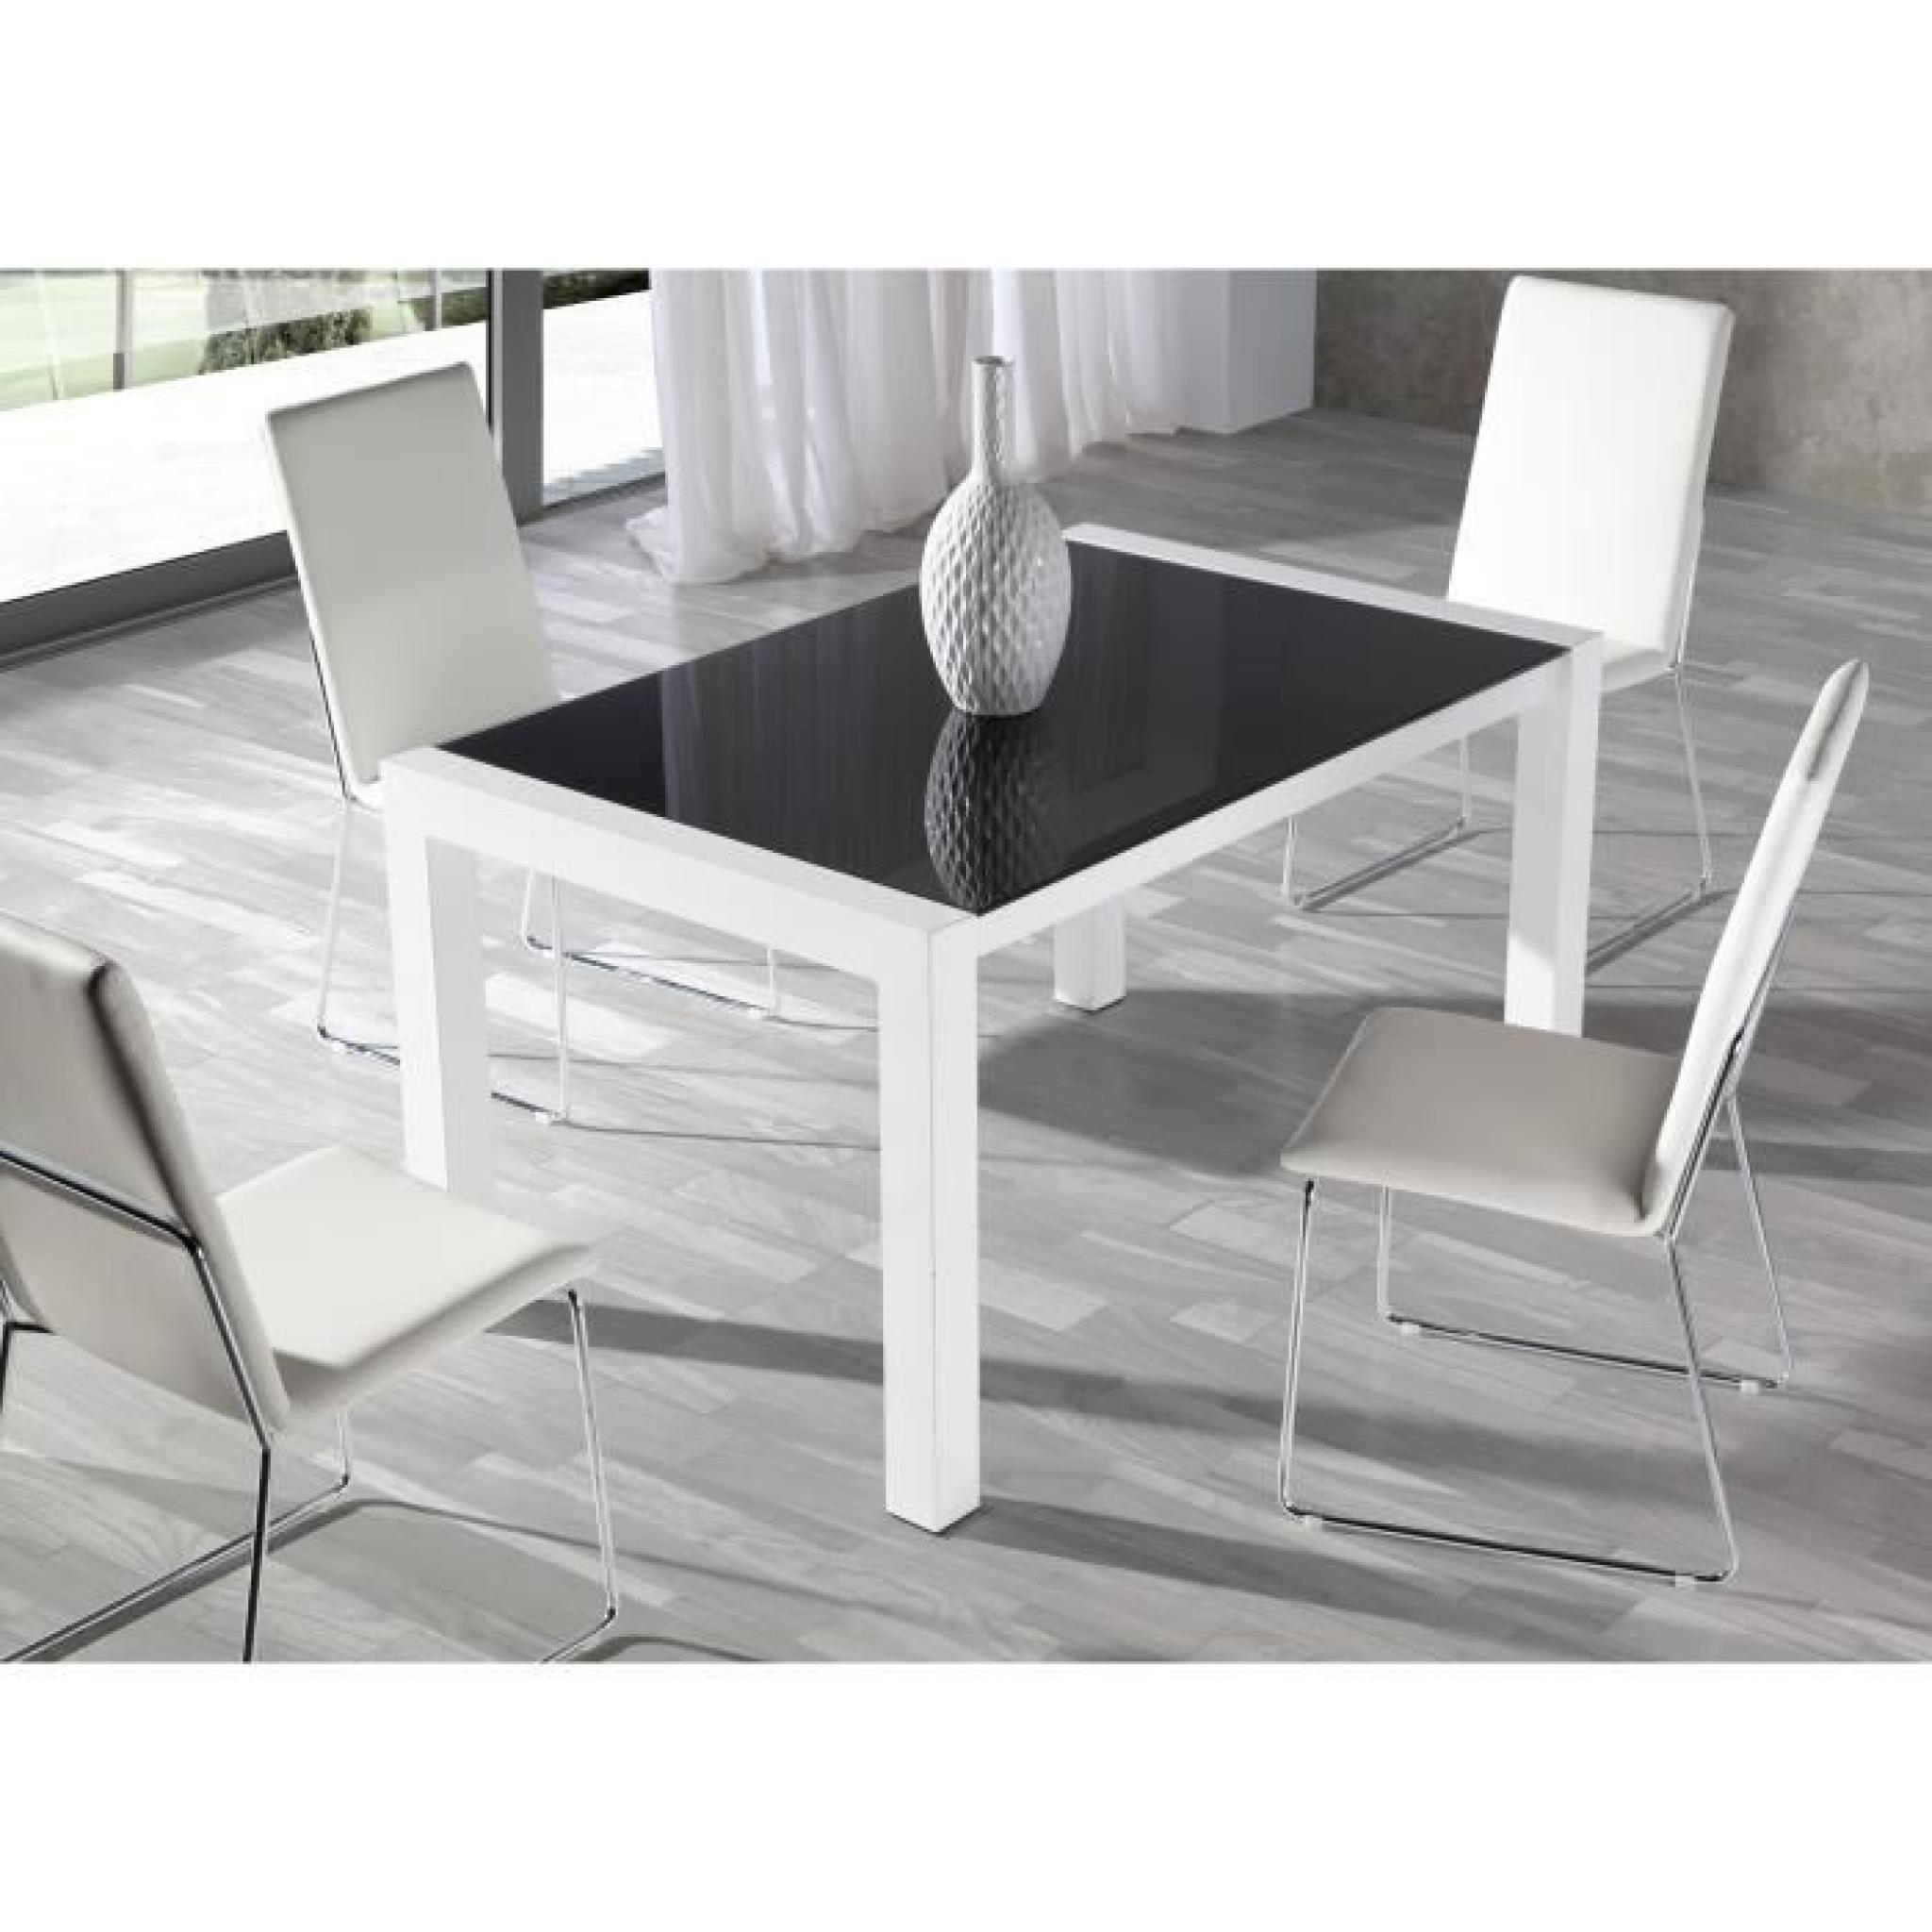 Quatuor de chaises pu blanc turin achat vente chaise - Chaises salle a manger design pas cher ...